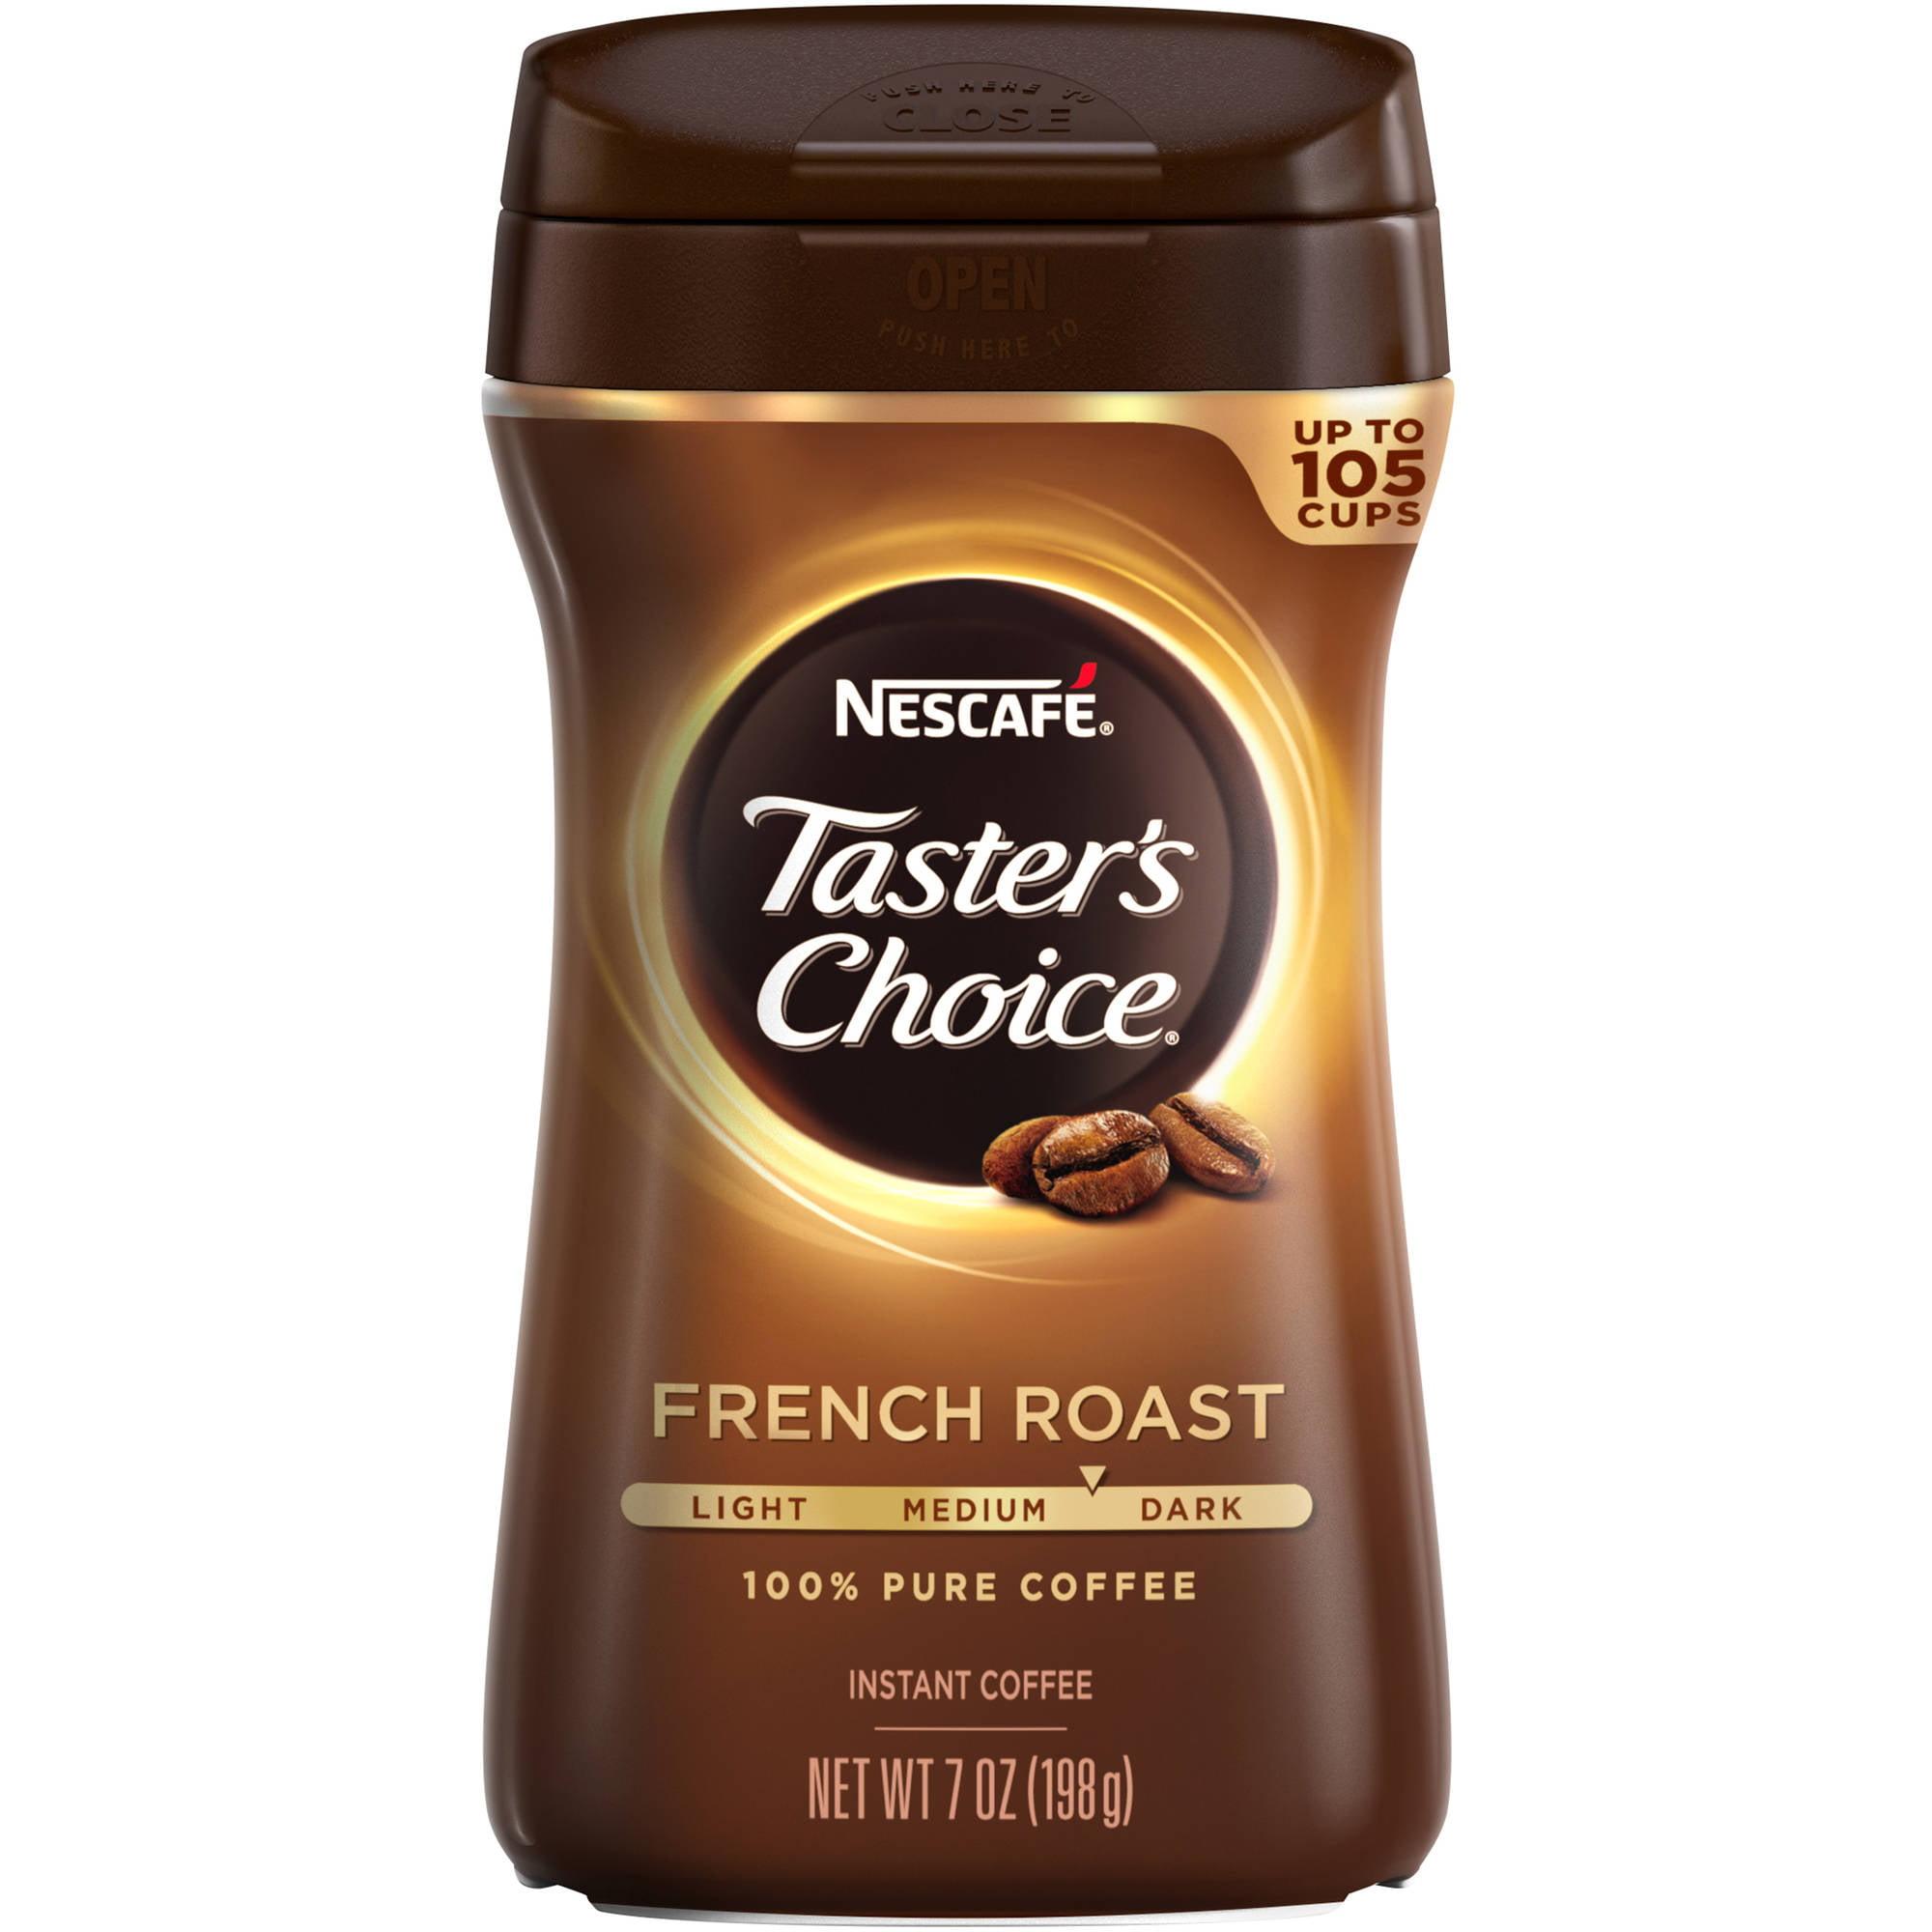 Nescafe Taster's Choice French Roast Instant Coffee, 7 oz